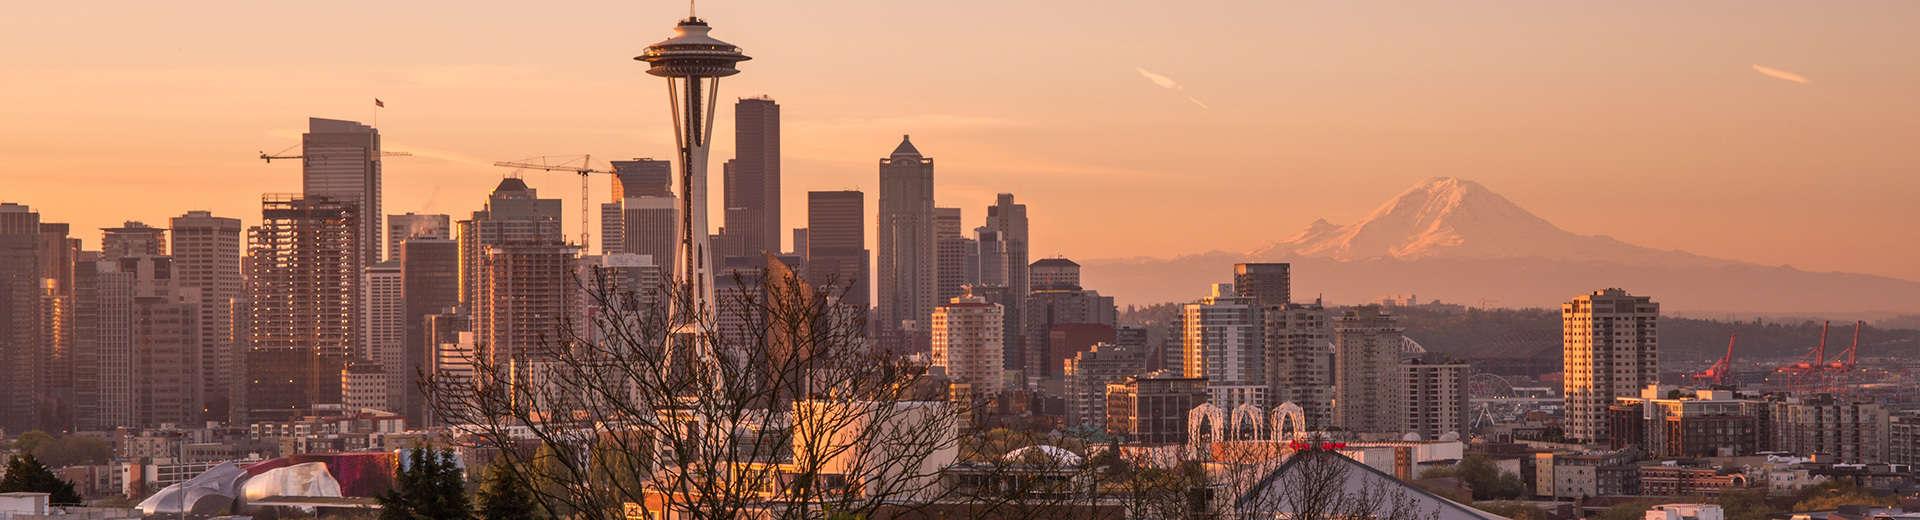 The Seattle skyline at twilight